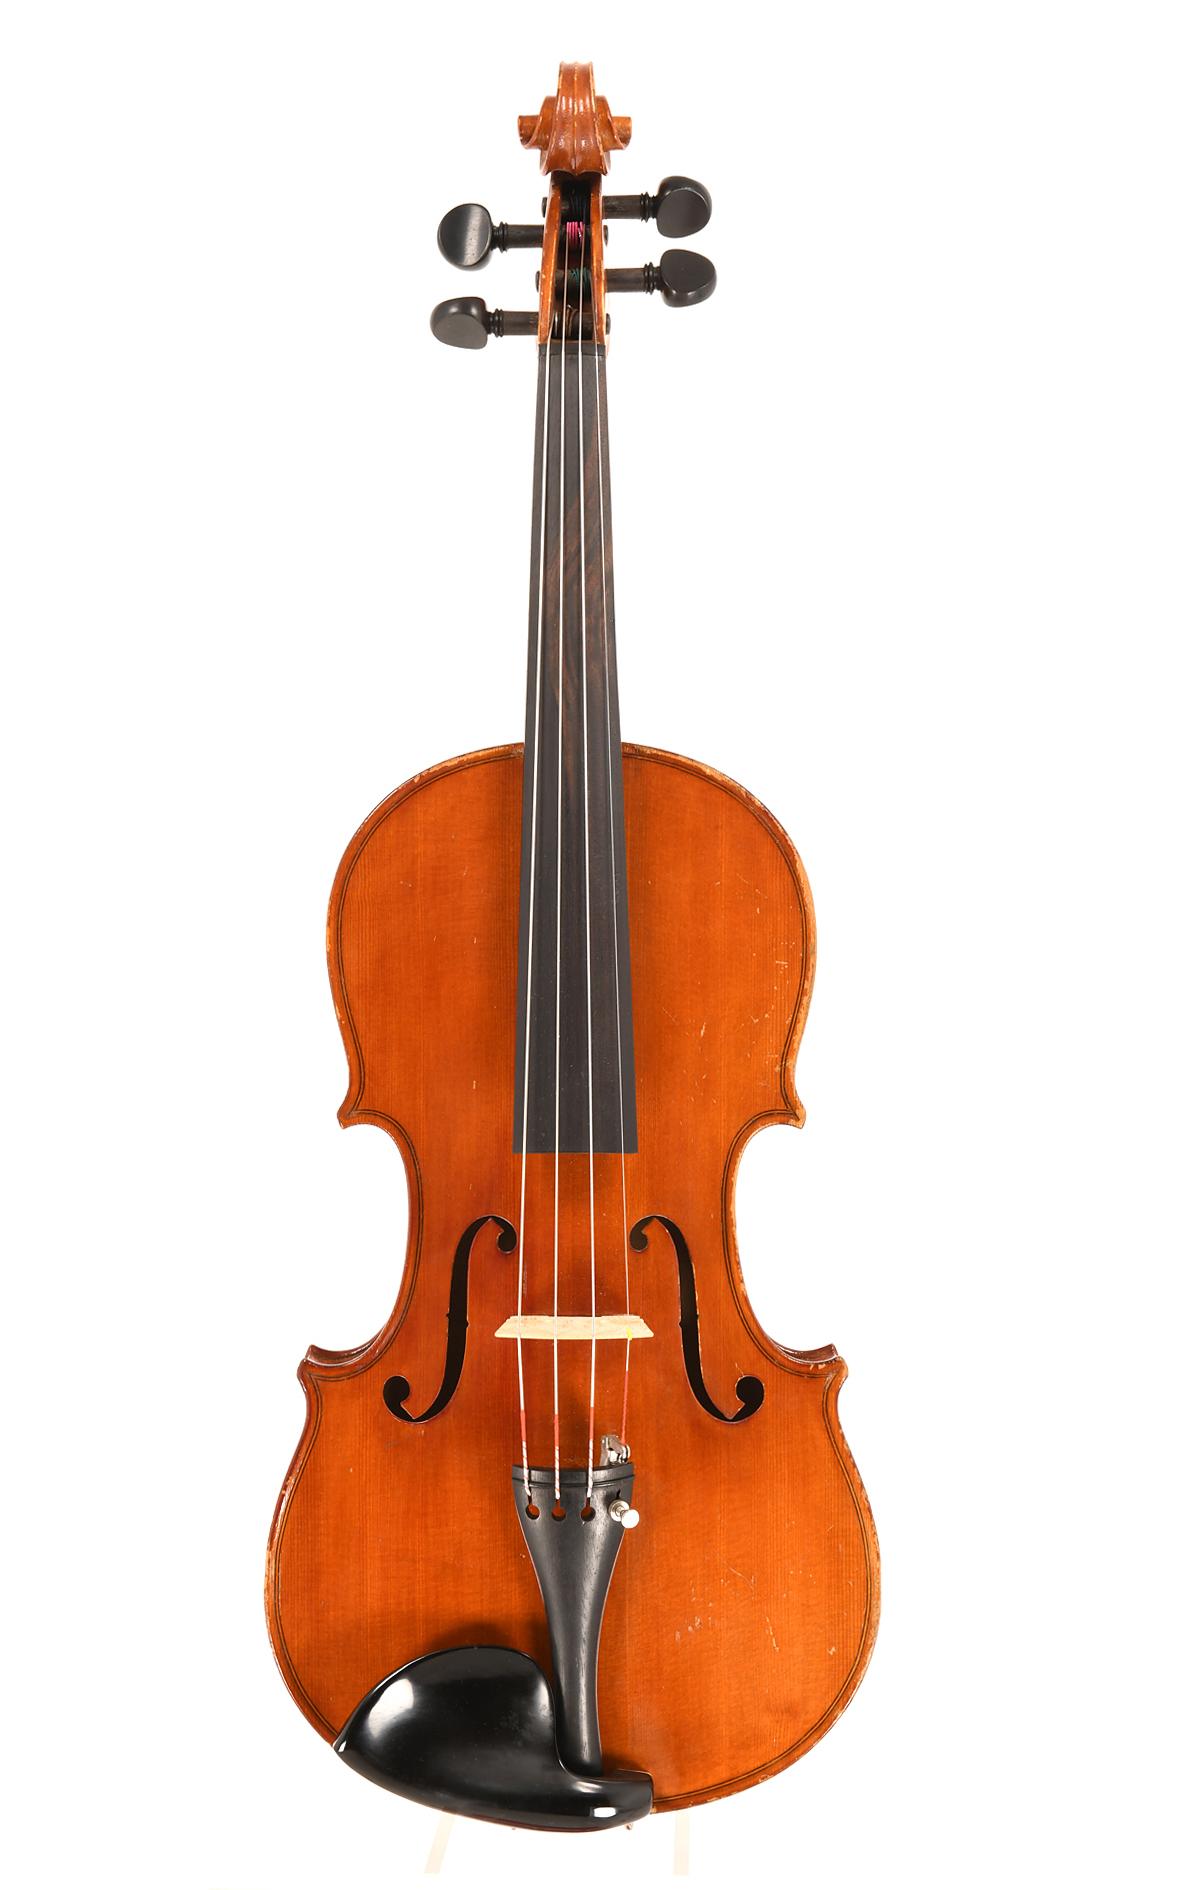 Antique Mittenwald 7/8 violin, approx. 1900 - Violins ...